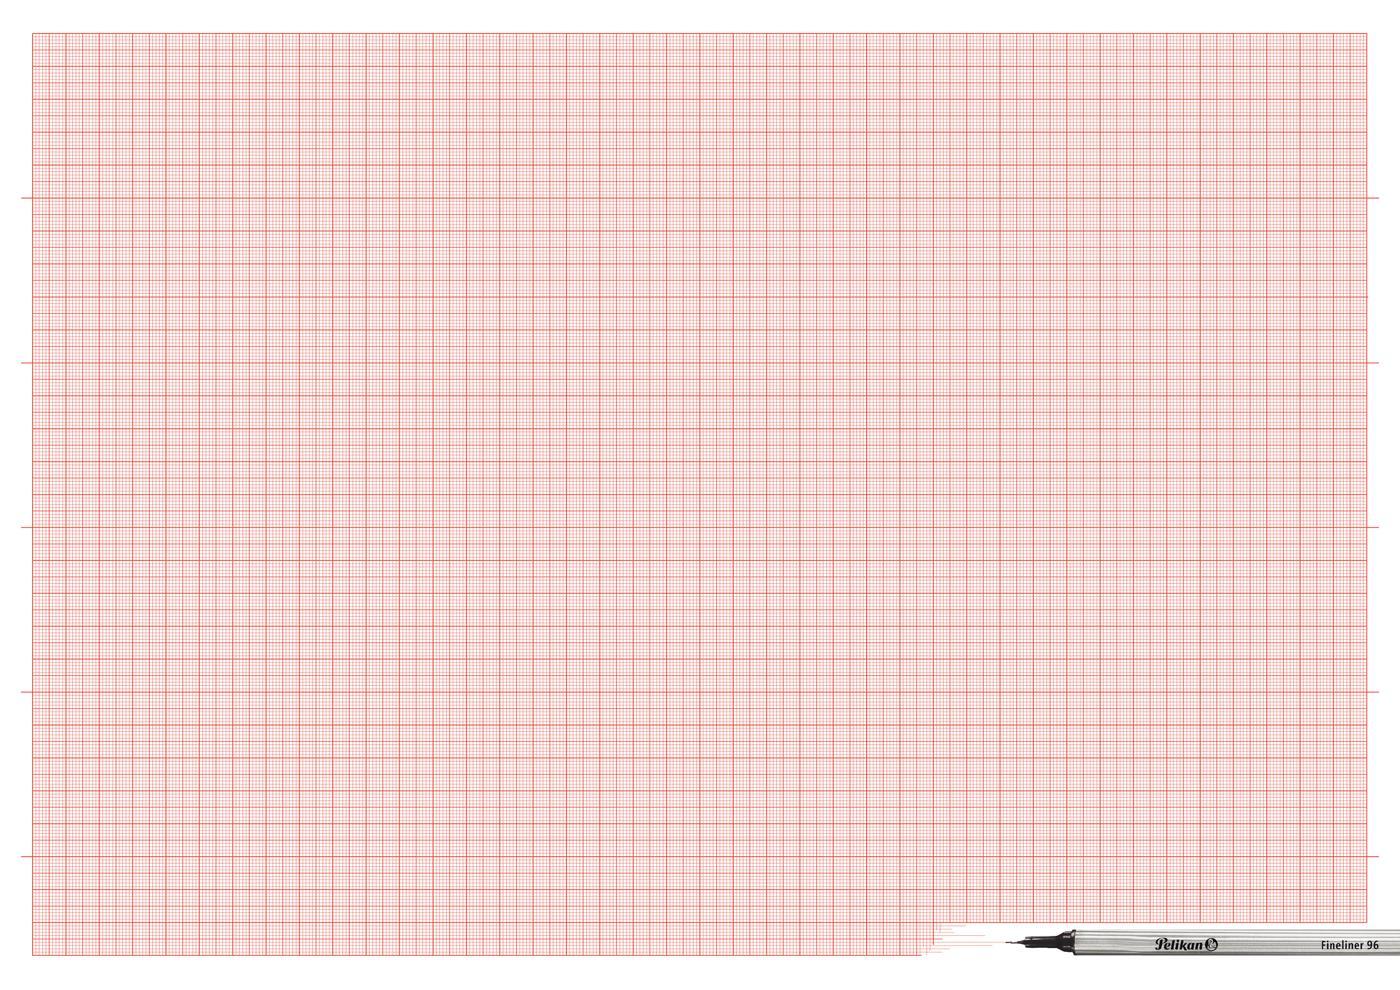 Pelikan Print Ad -  Plotting paper